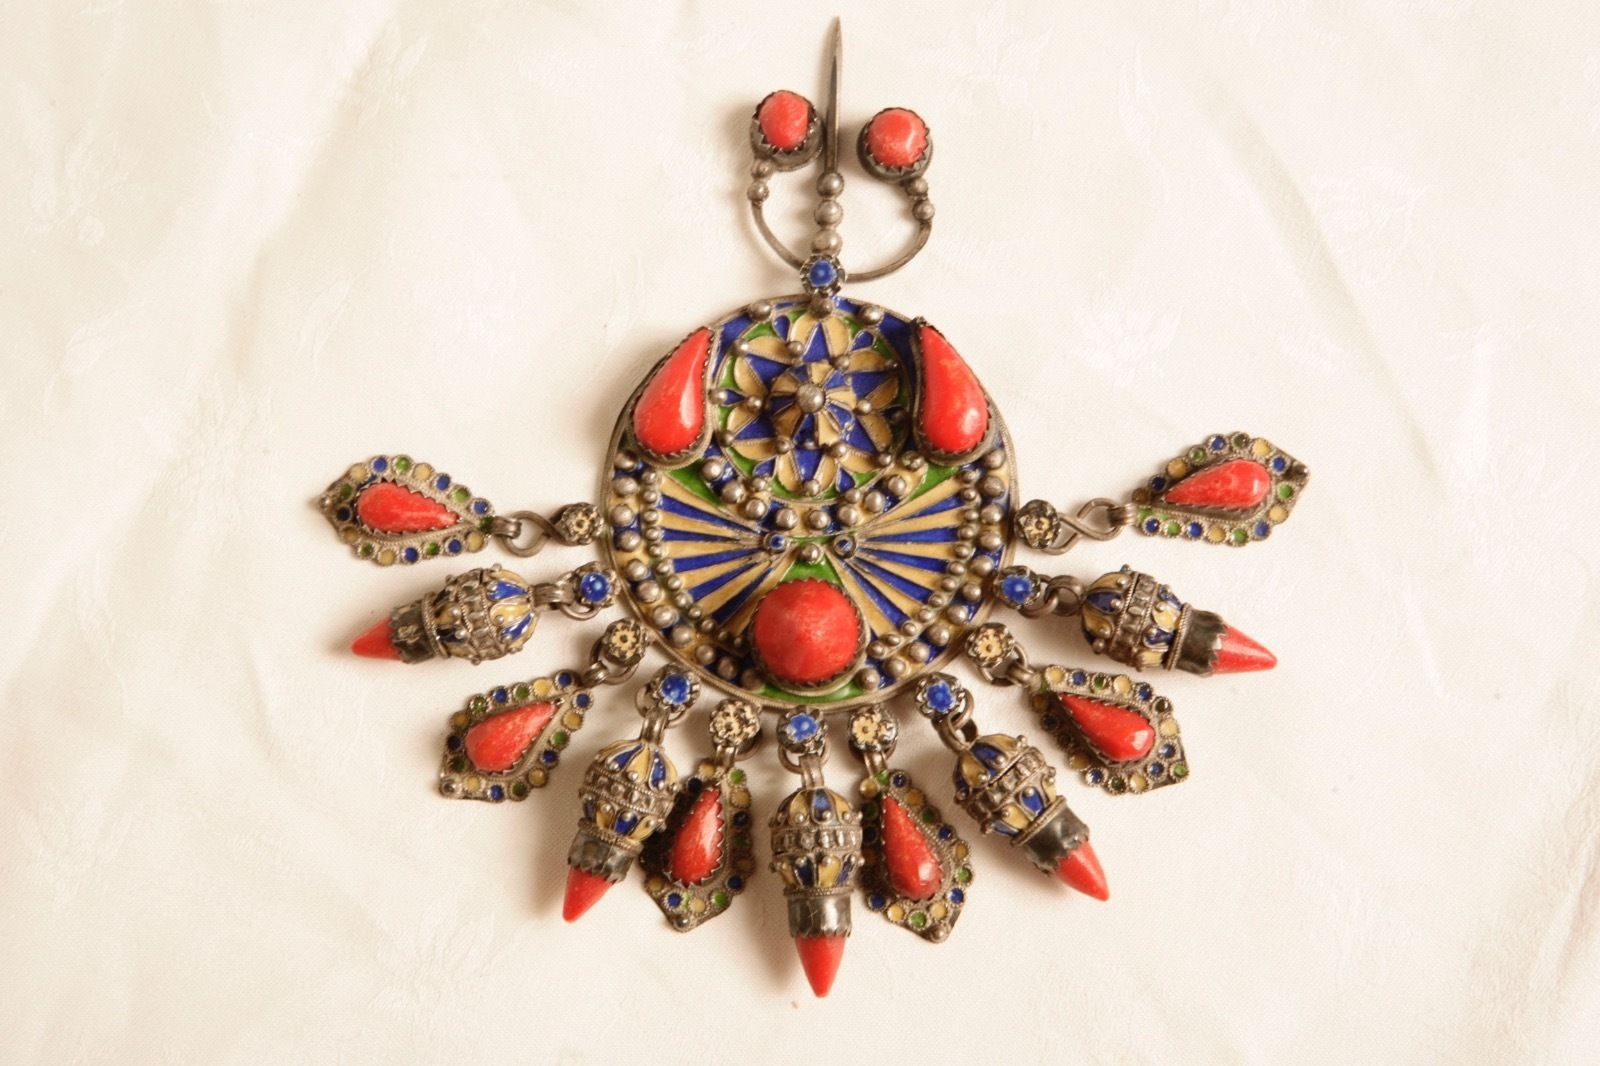 Bijoux Algerie Argent : Grande fibule bijou berbere beni yenni argent algerie